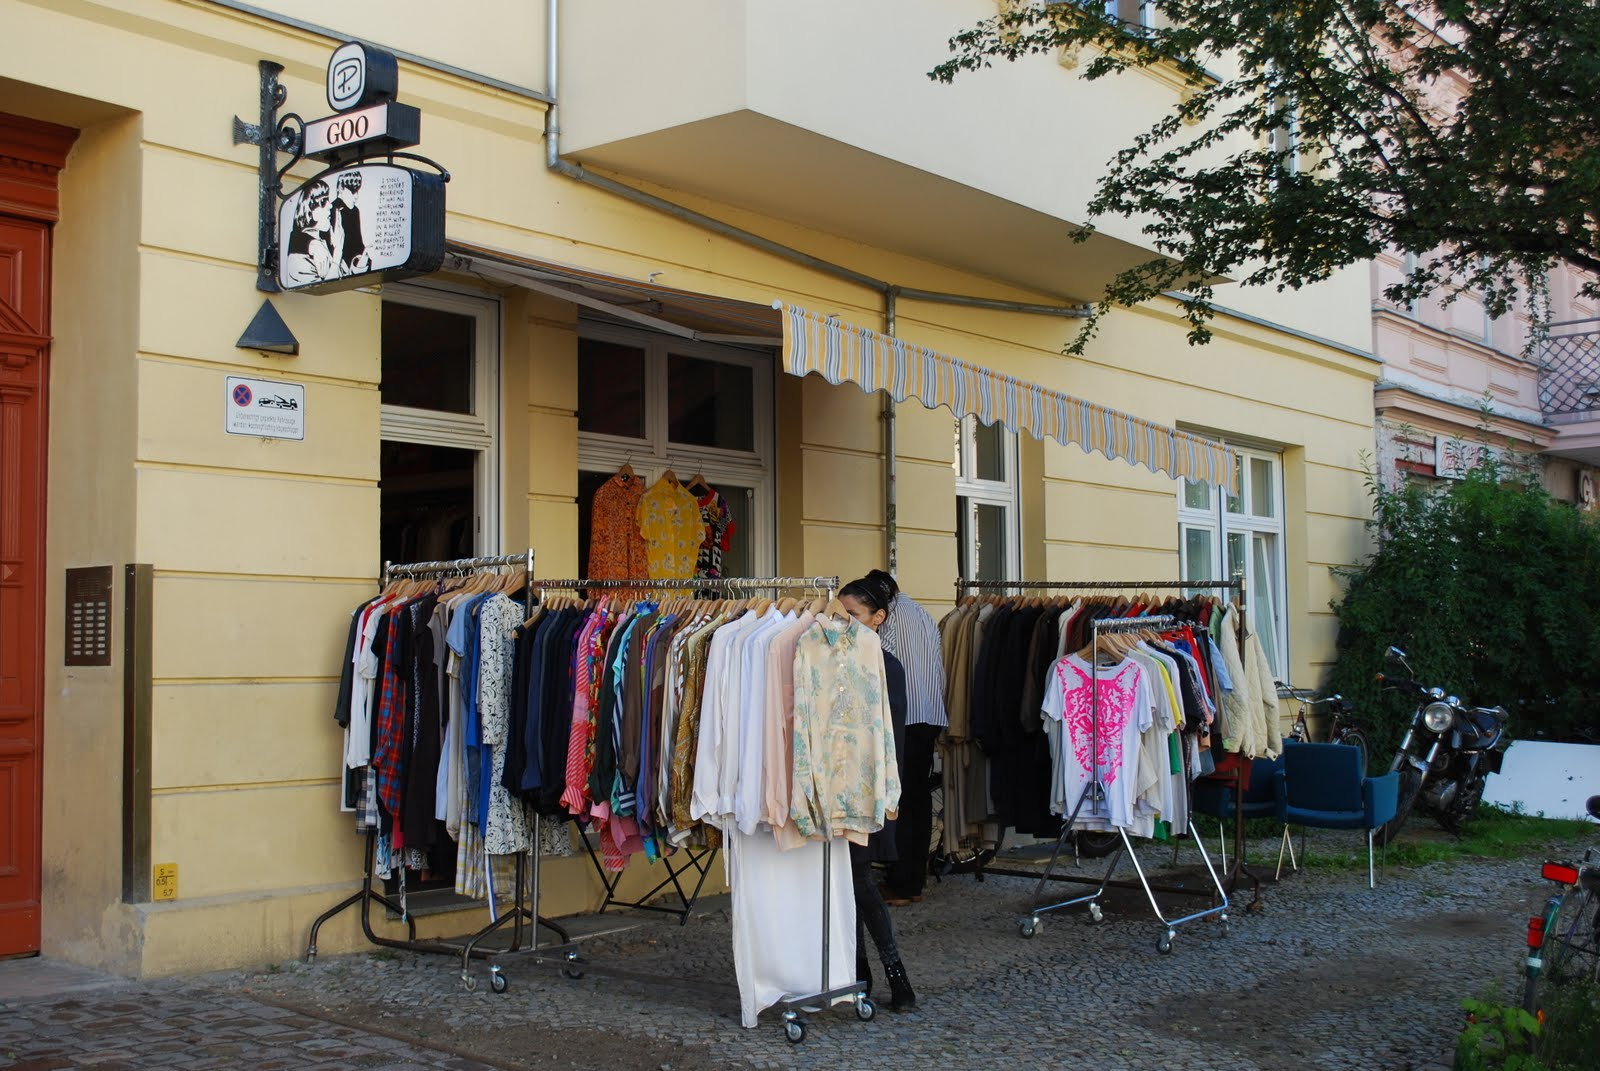 Sommerladen Berlin